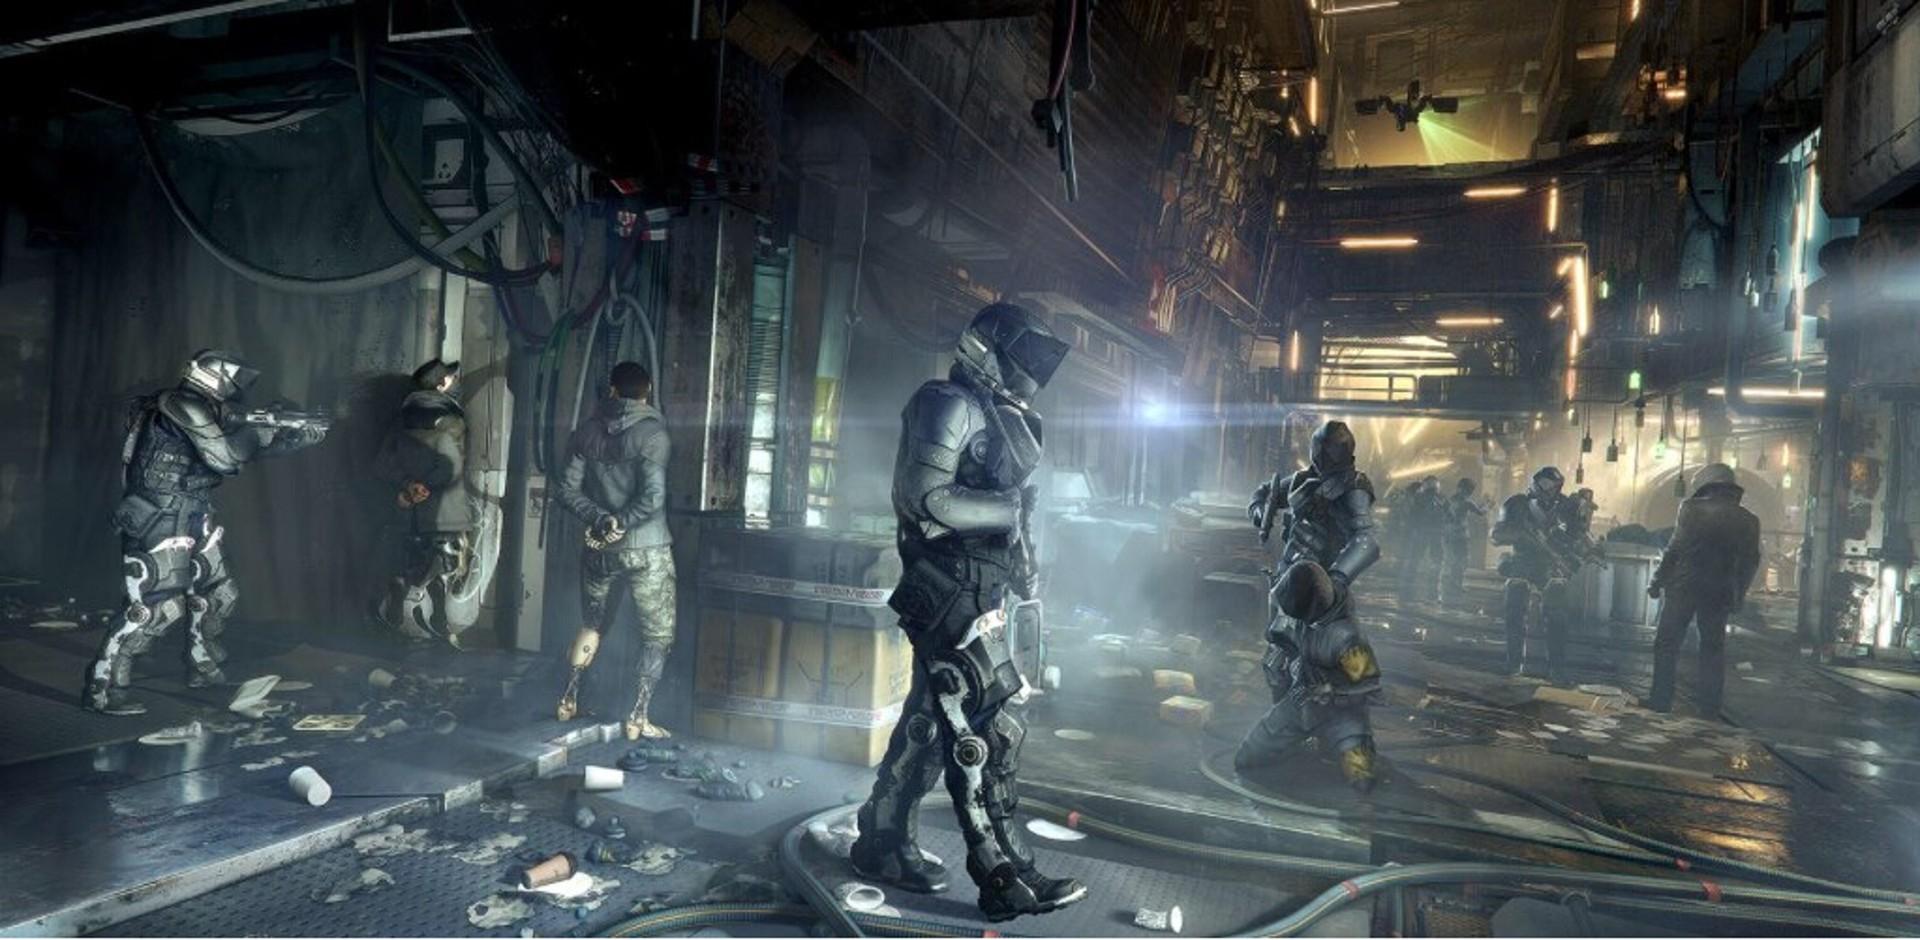 General 1920x940 Deus Ex: Mankind Divided video games PC gaming video game art futuristic